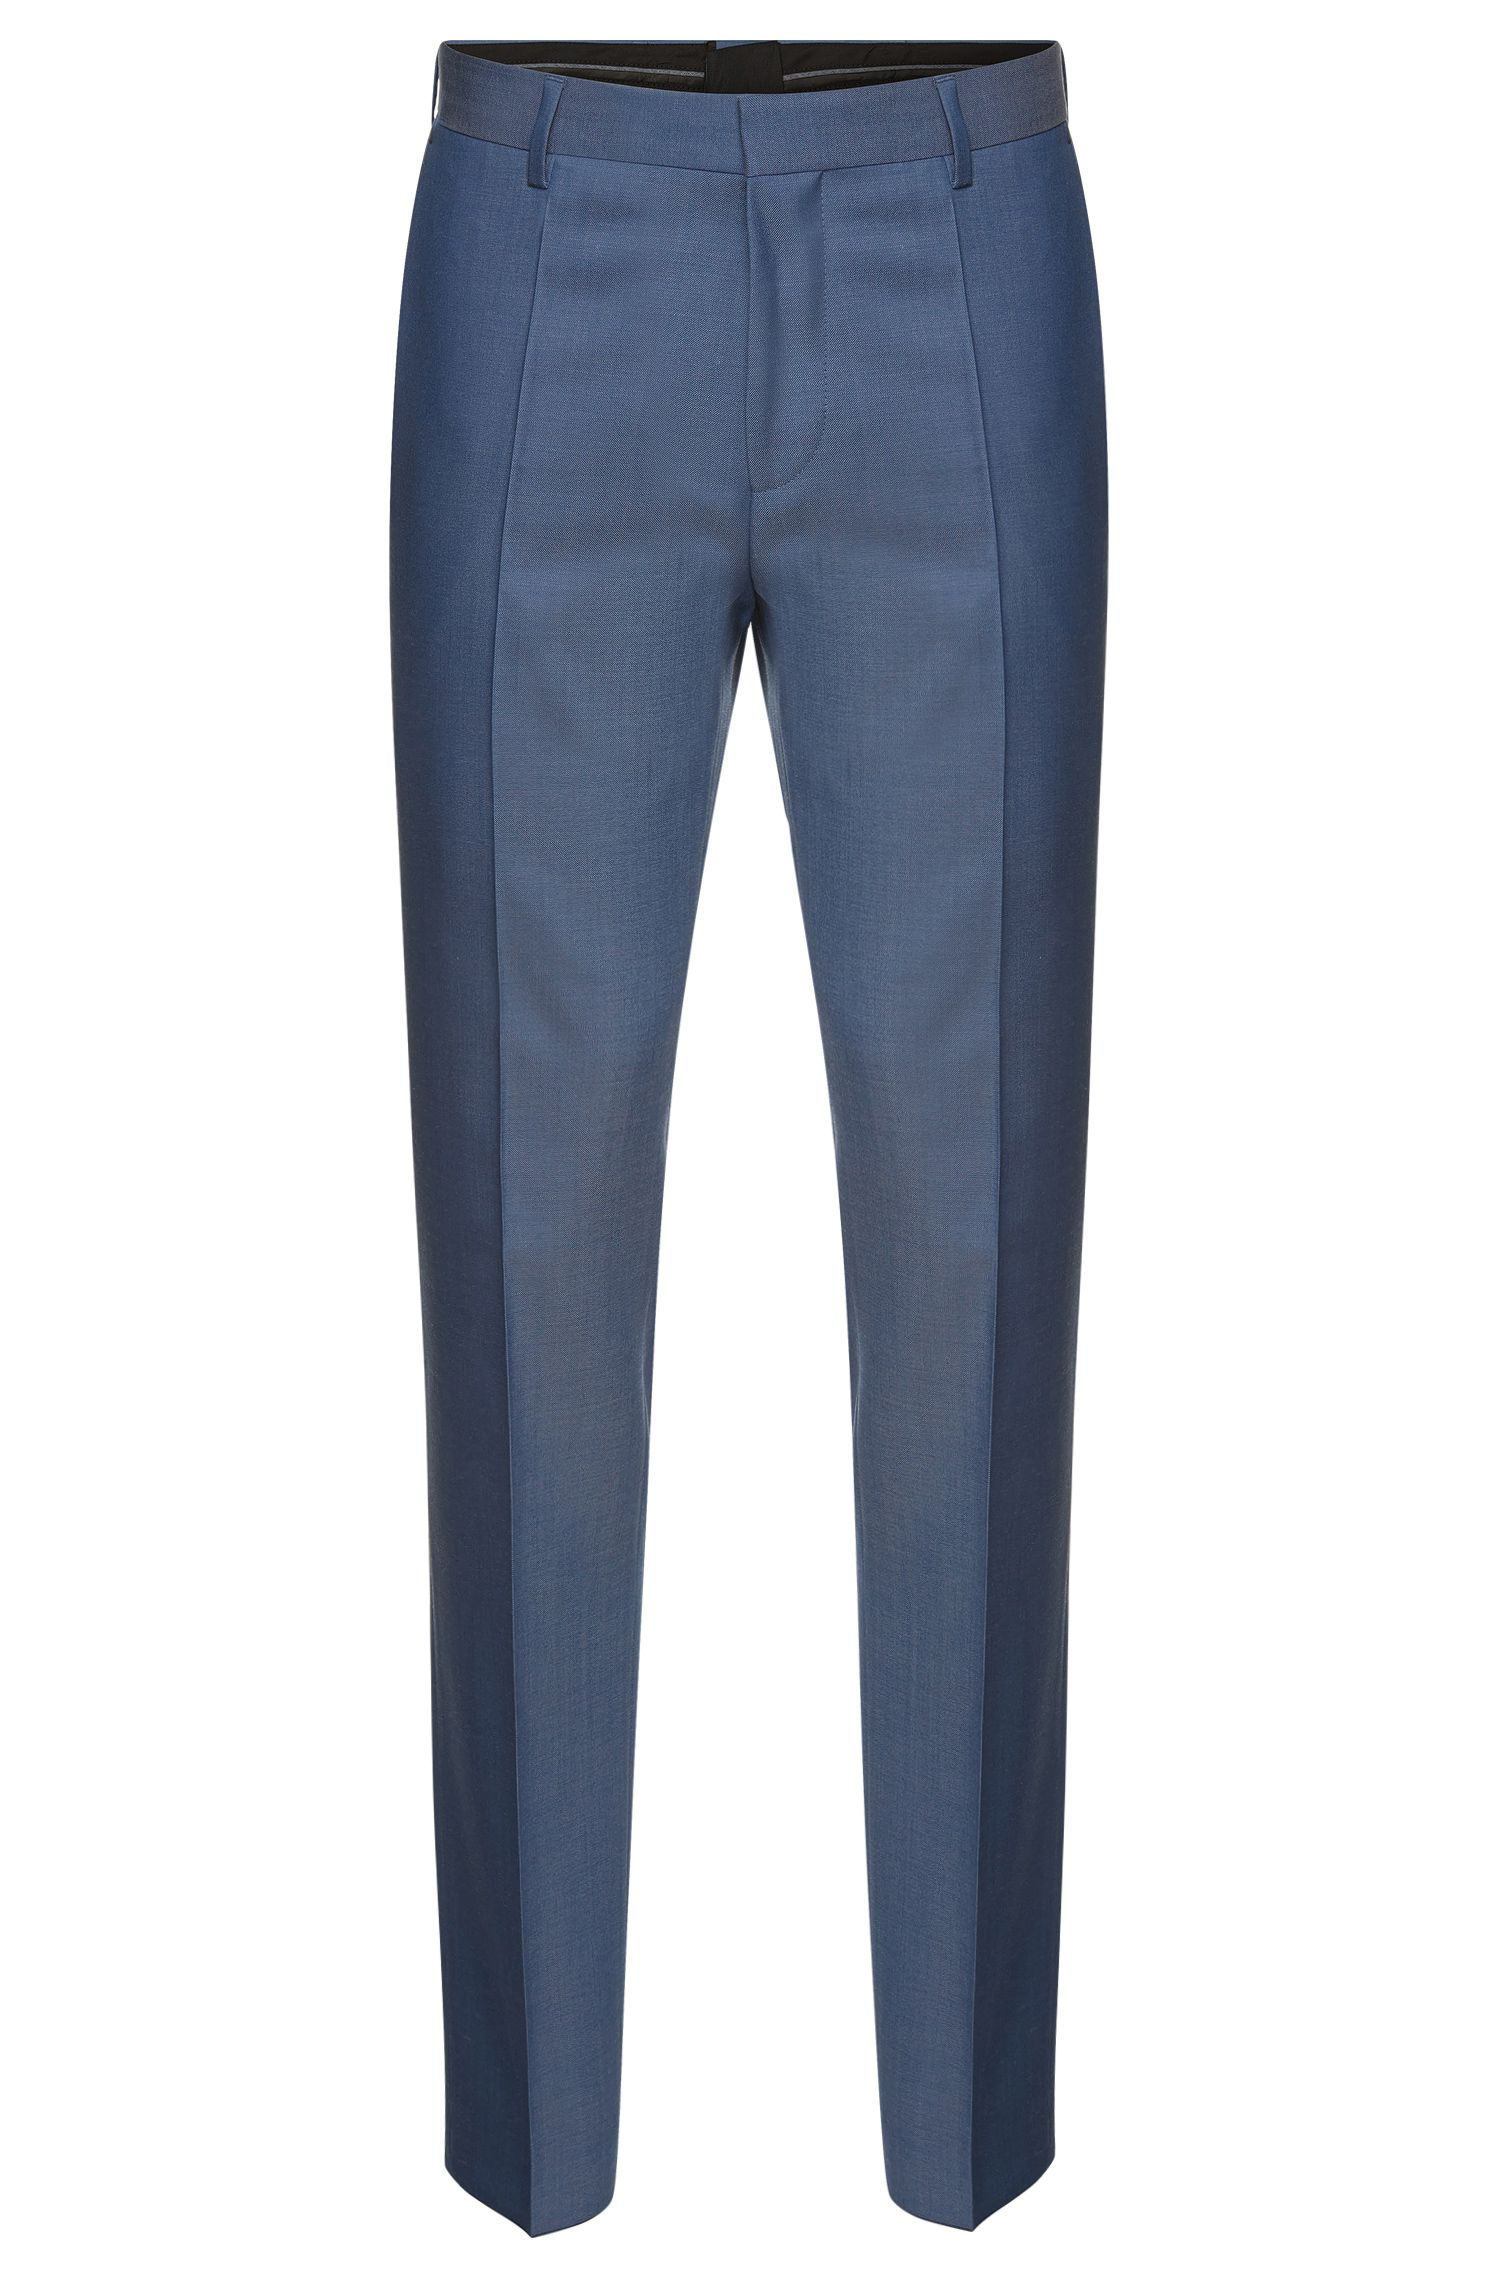 'Genesis' | Slim Fit, Italian Super 100 Virgin Wool Dress Pants